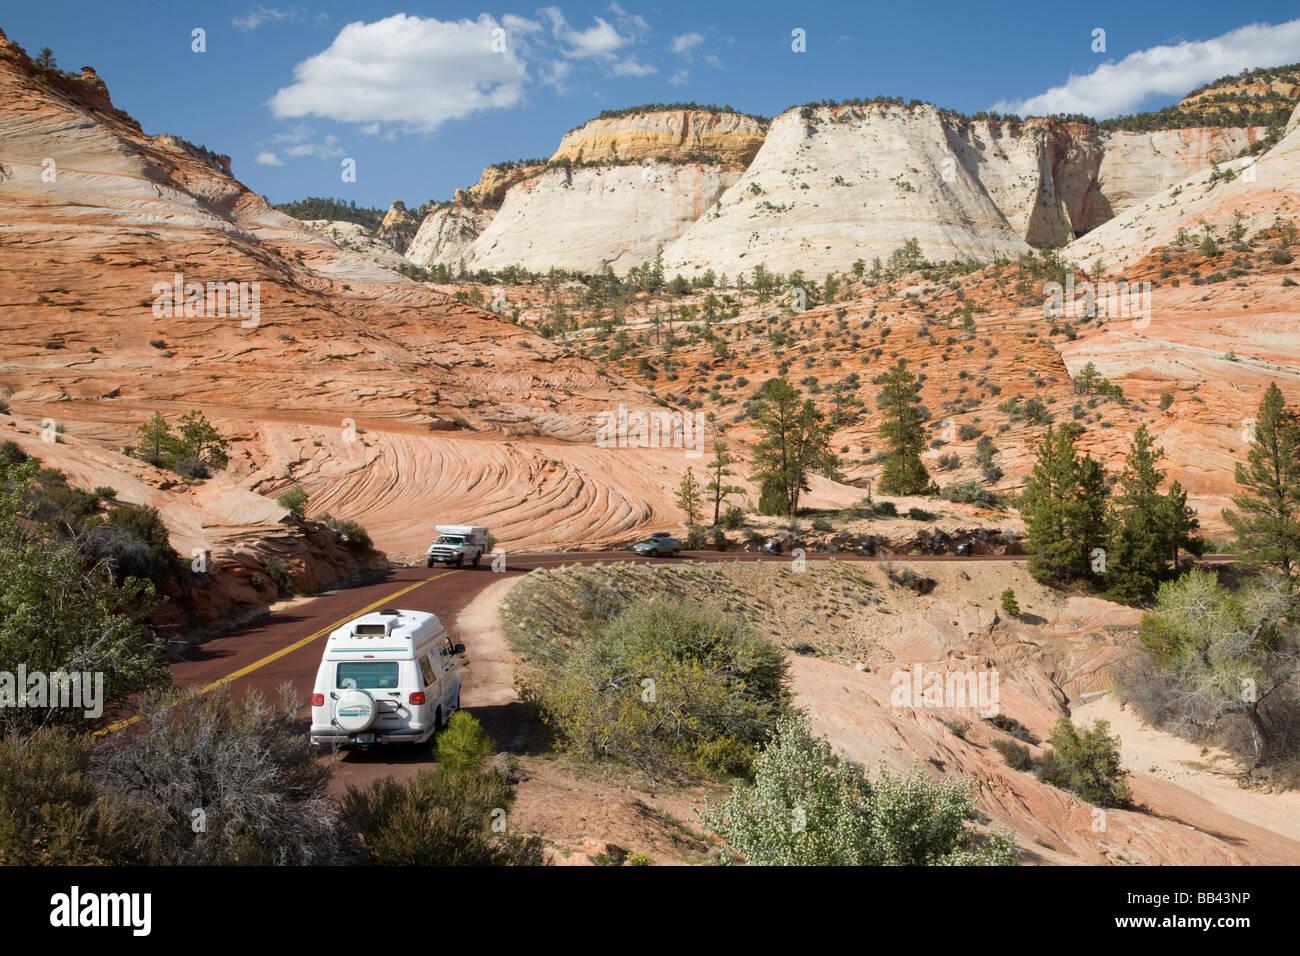 utah, zion national park, zion-mount carmel highway, rv, truck